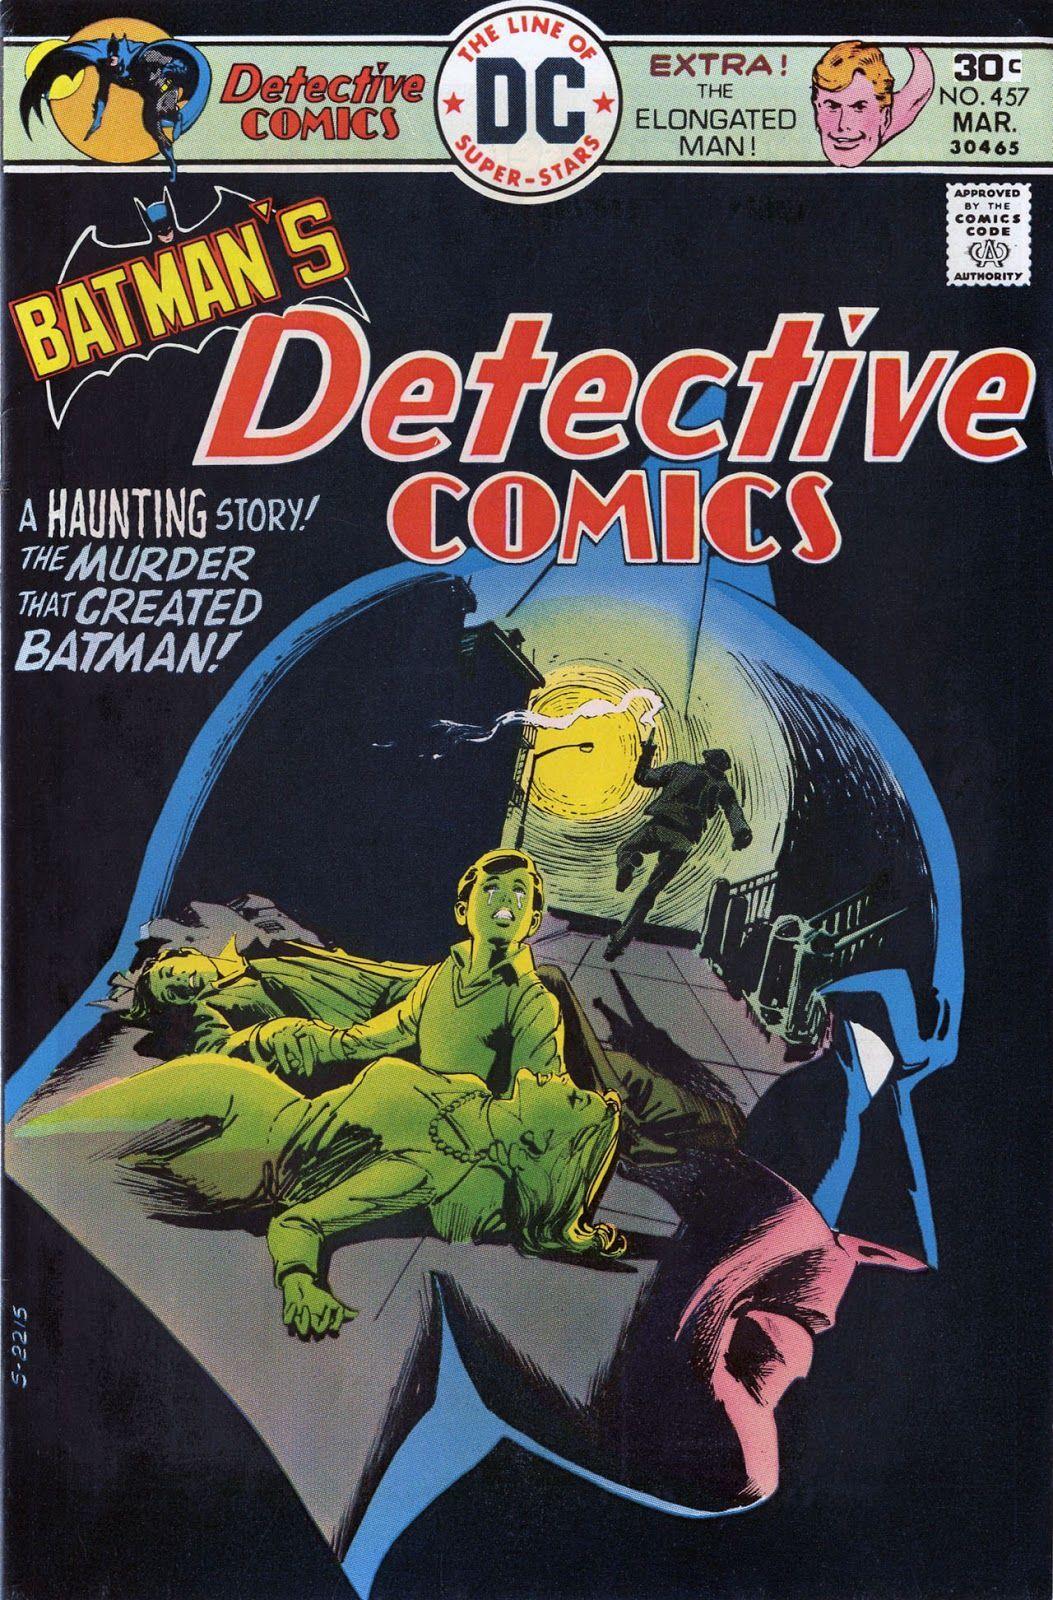 Detective Comics #475  (Writer Denny O'Neil, Art by Dick Giordano)